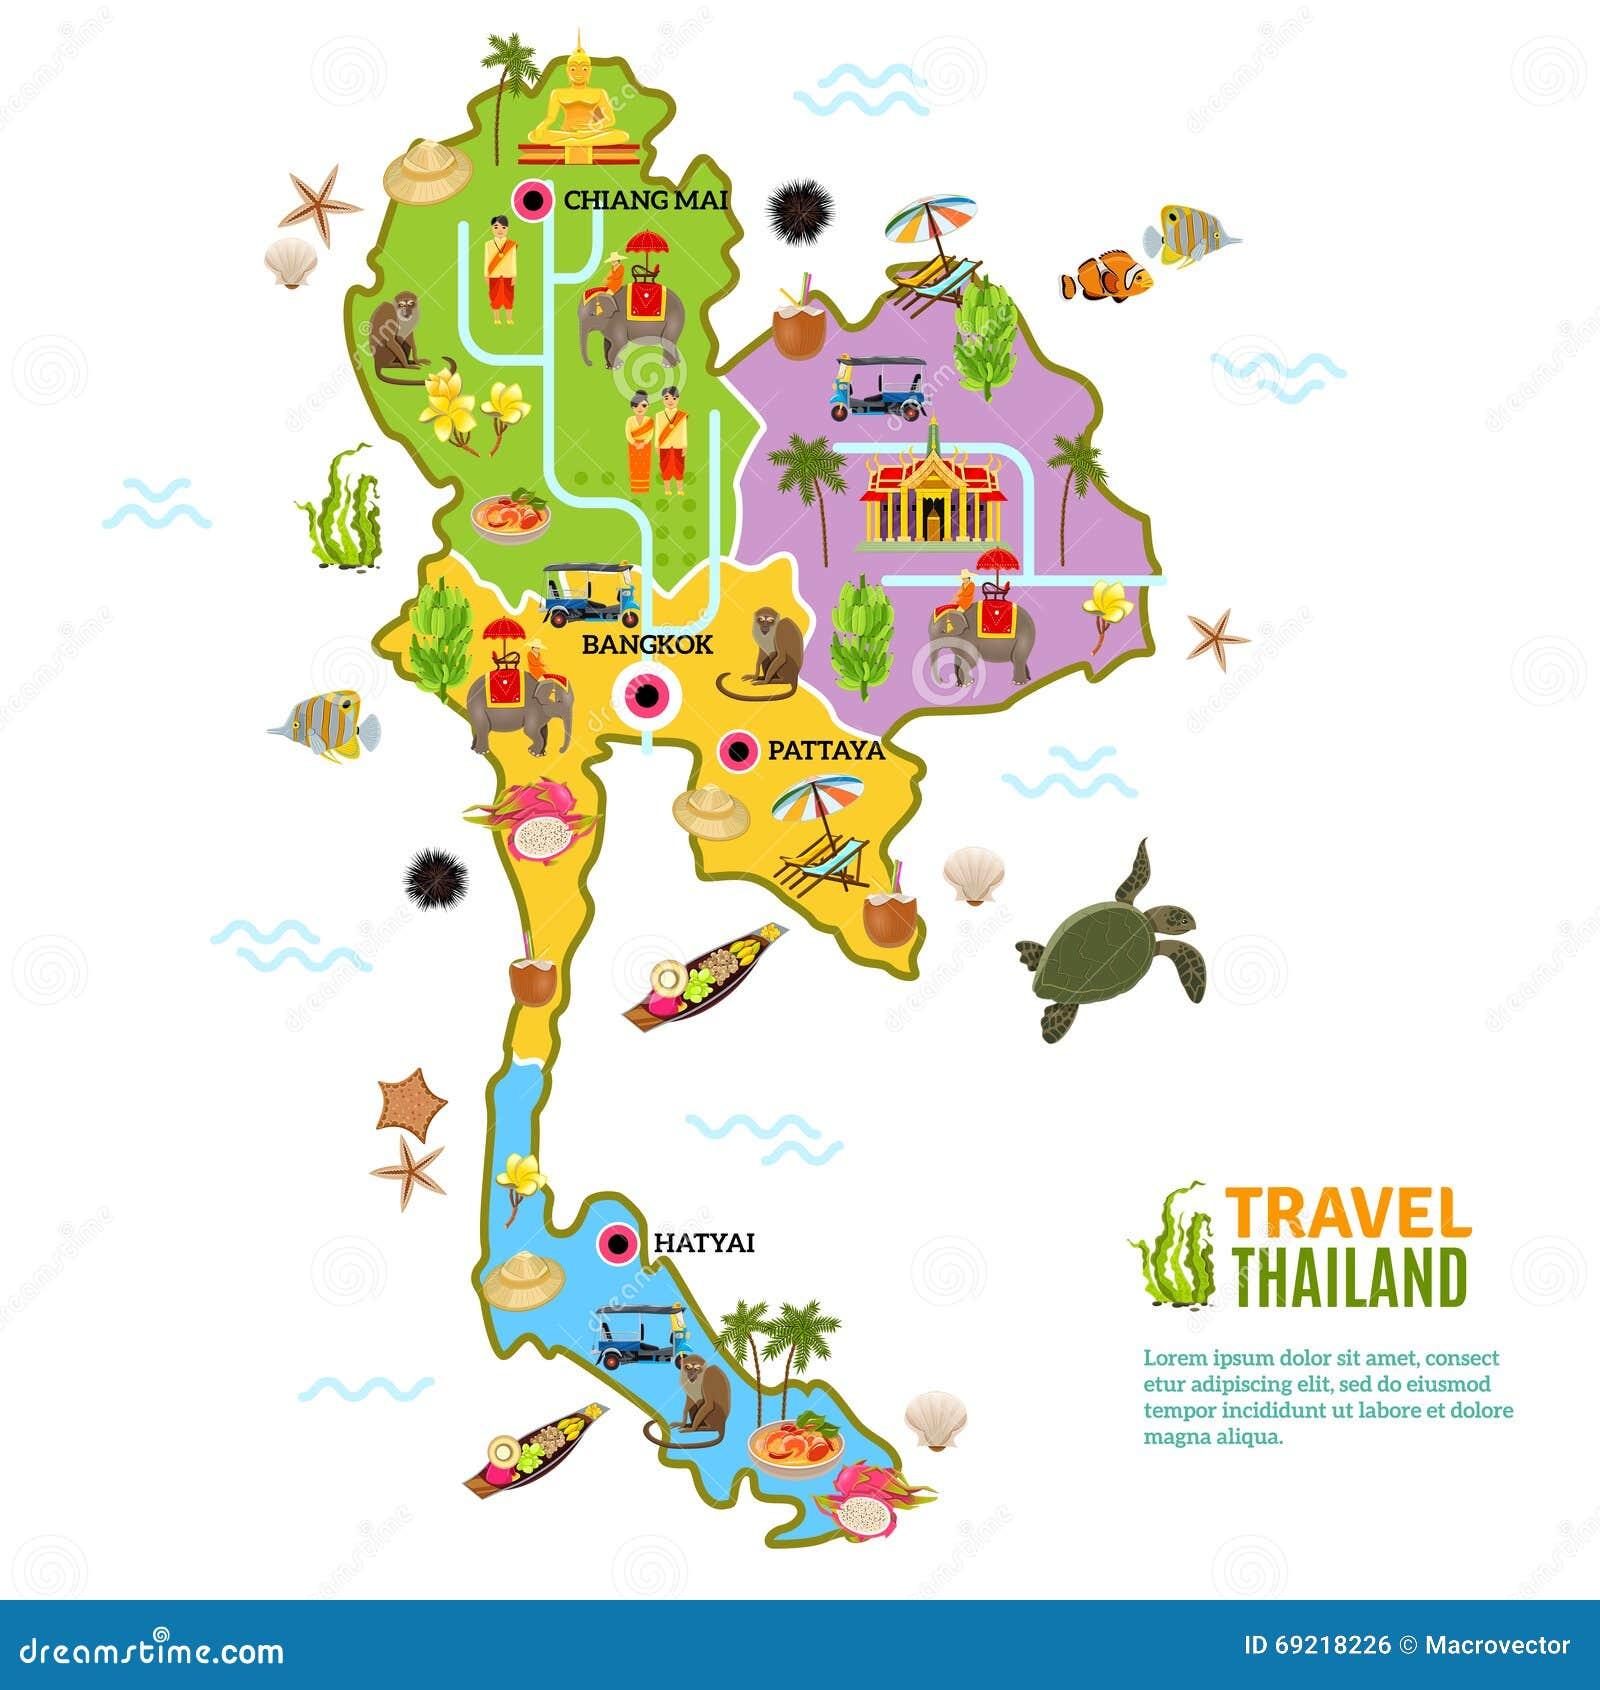 Thailand Map Poster Stock Illustration. Illustration Of